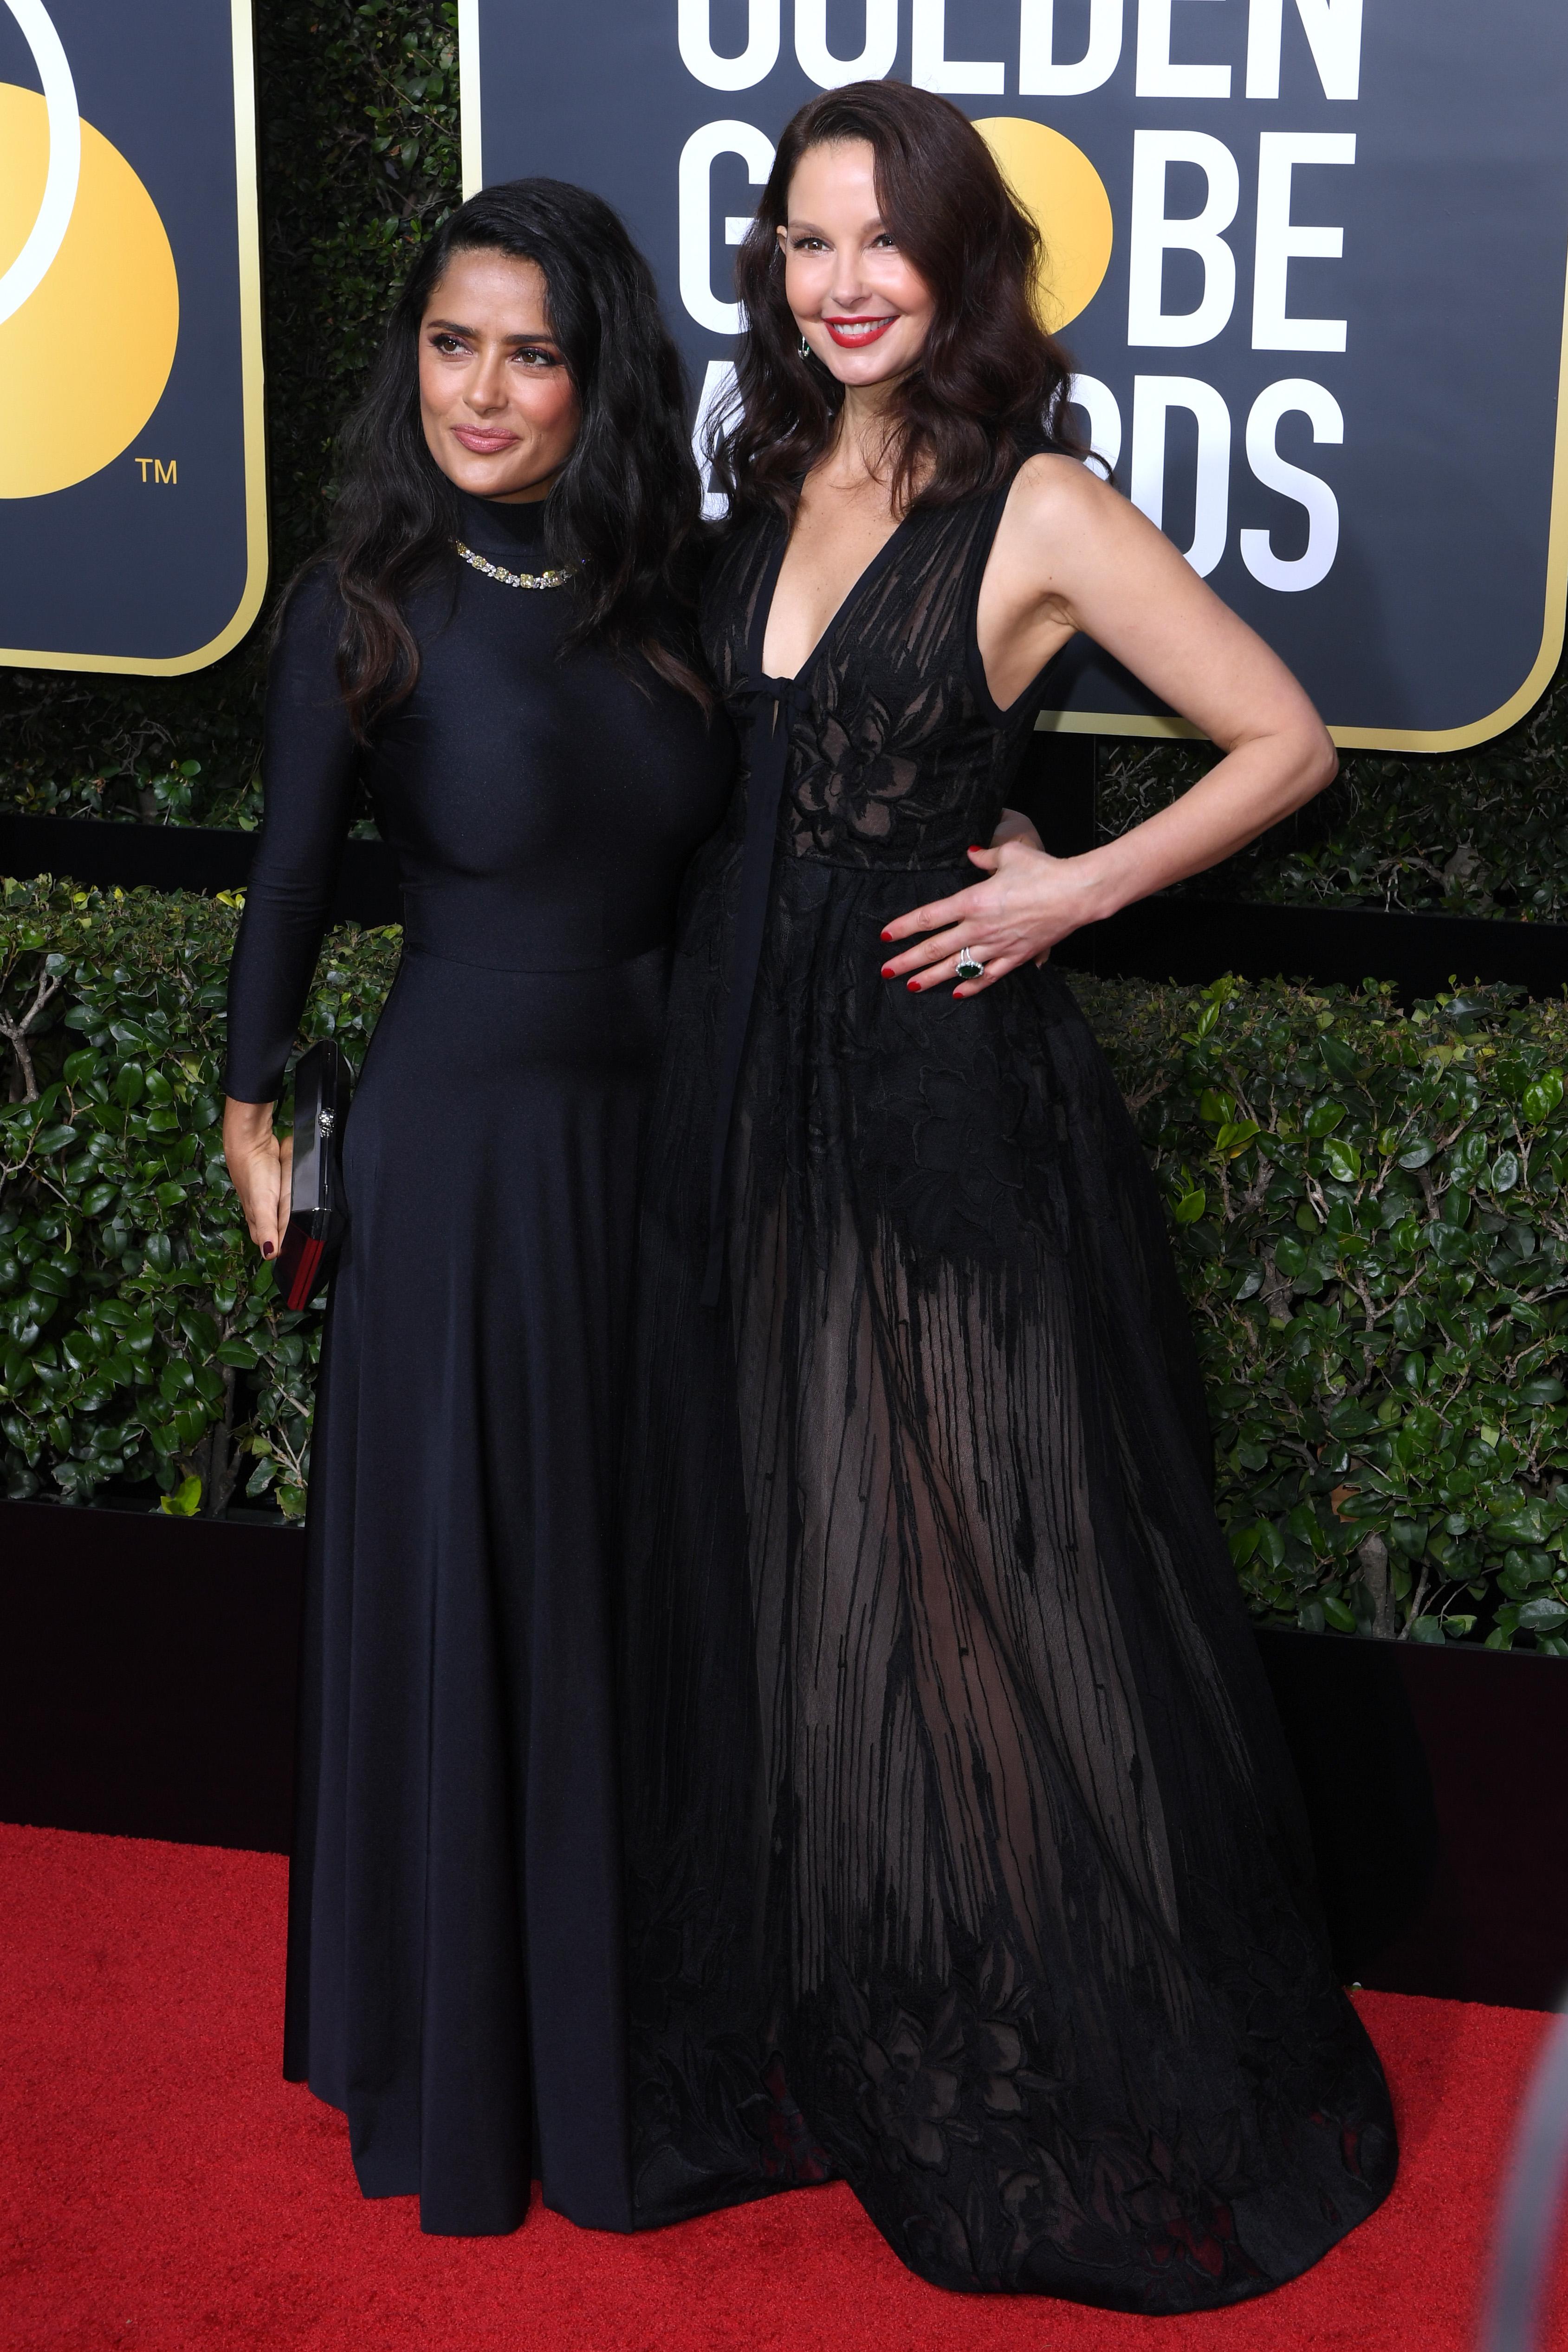 Salma Hayek and Ashley Judd75th Annual Golden Globe Awards, Arrivals, Los Angeles, USA - 07 Jan 2018